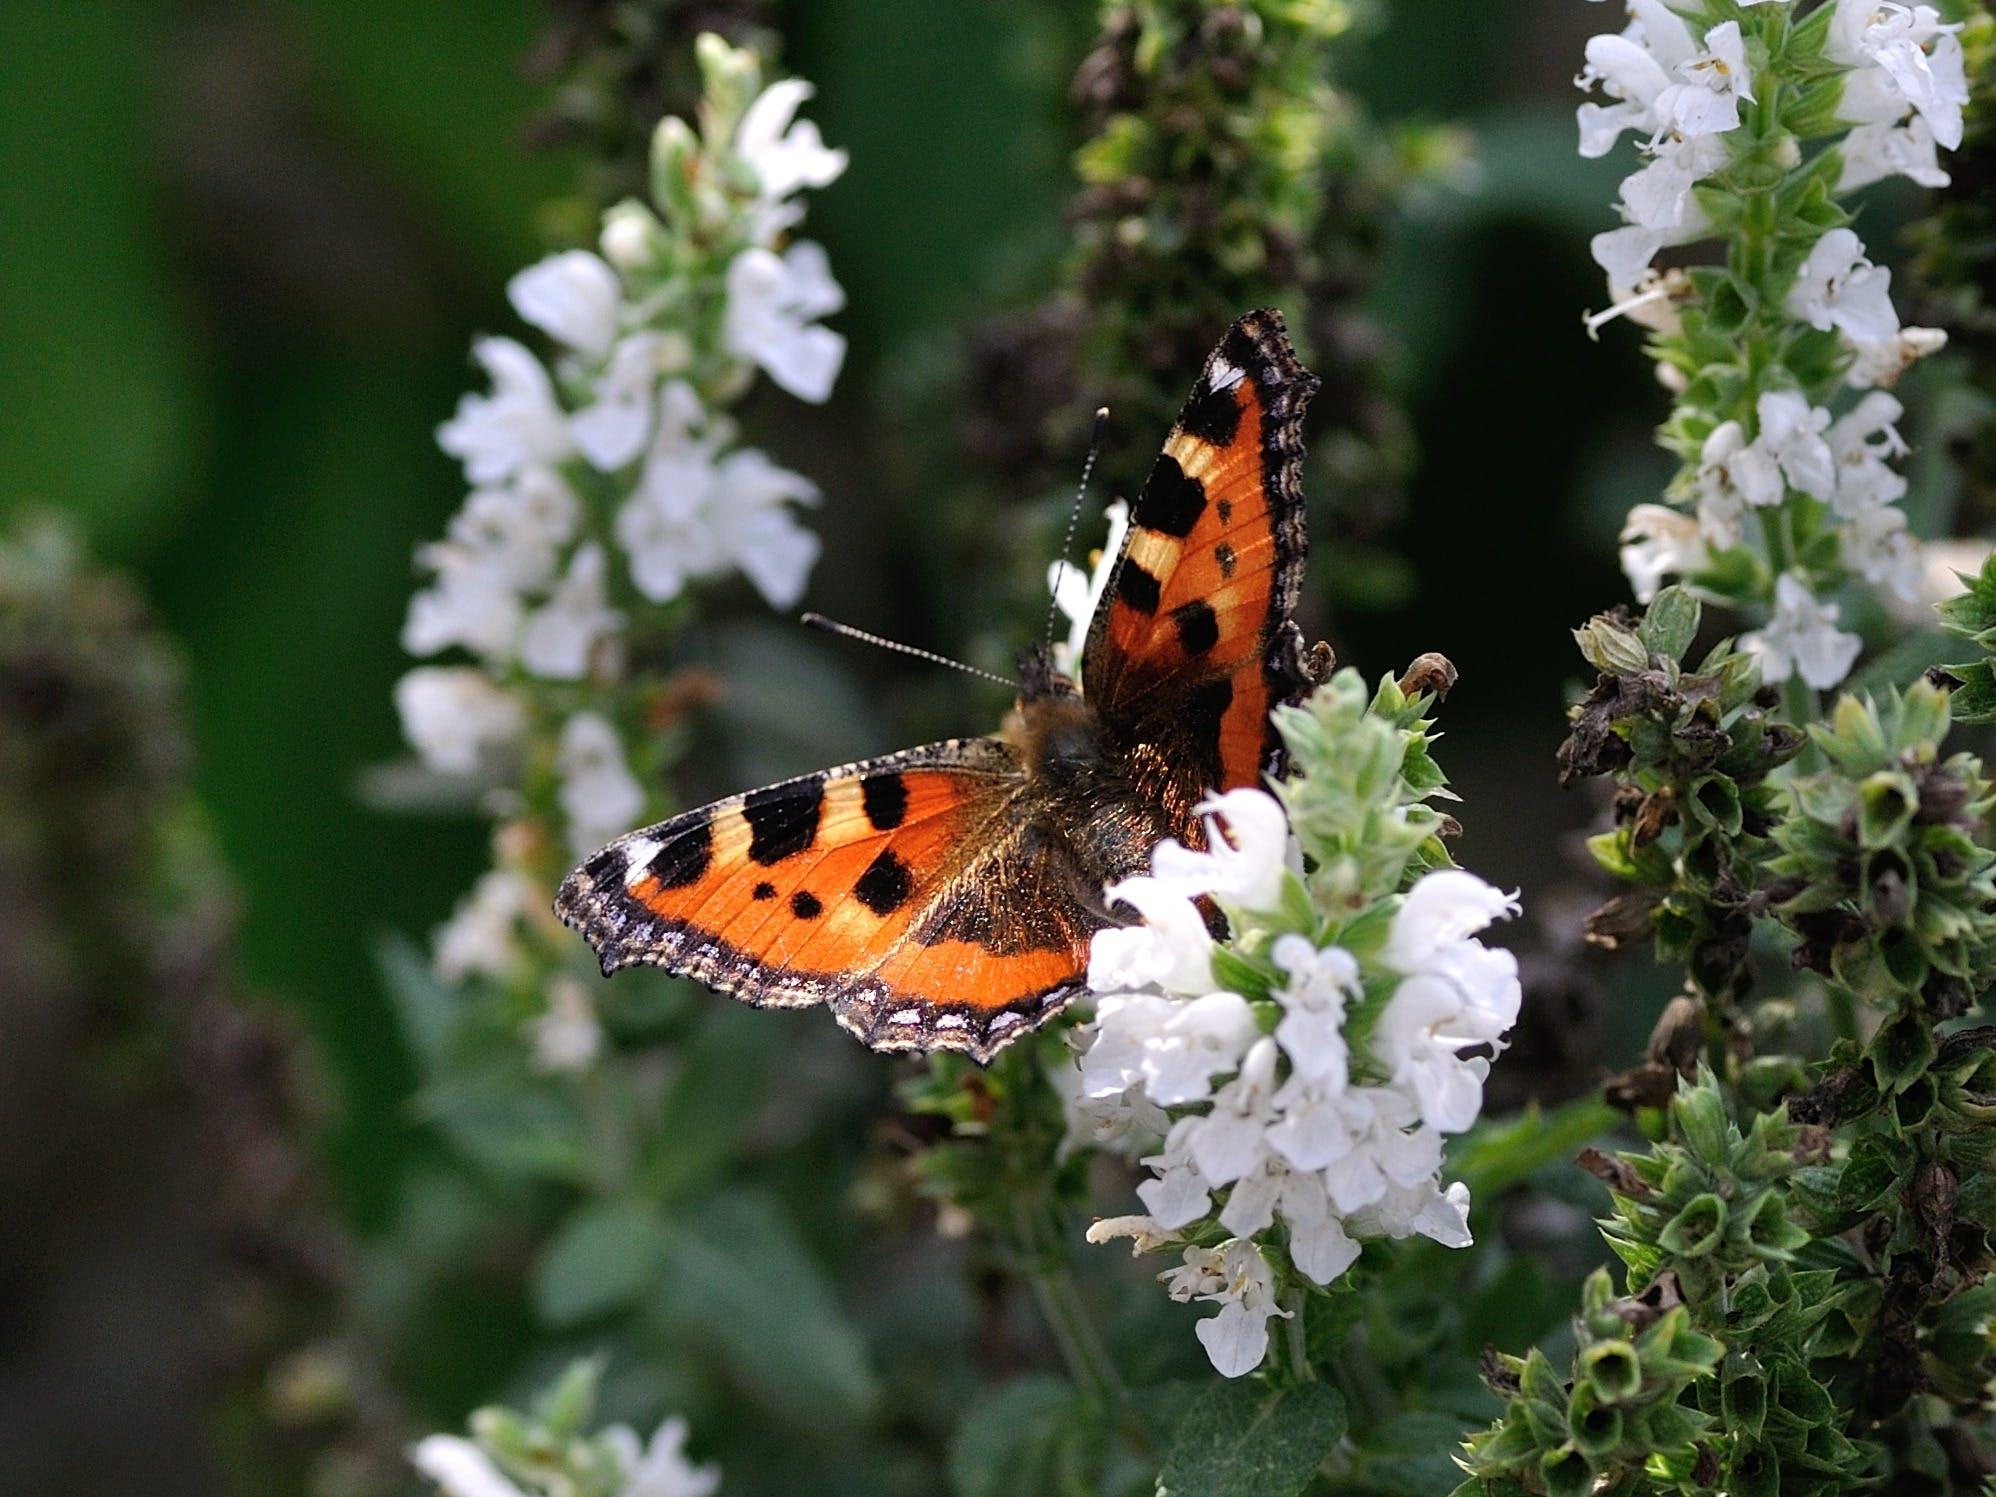 Orange Black and White Butterfly on White Petal Flower